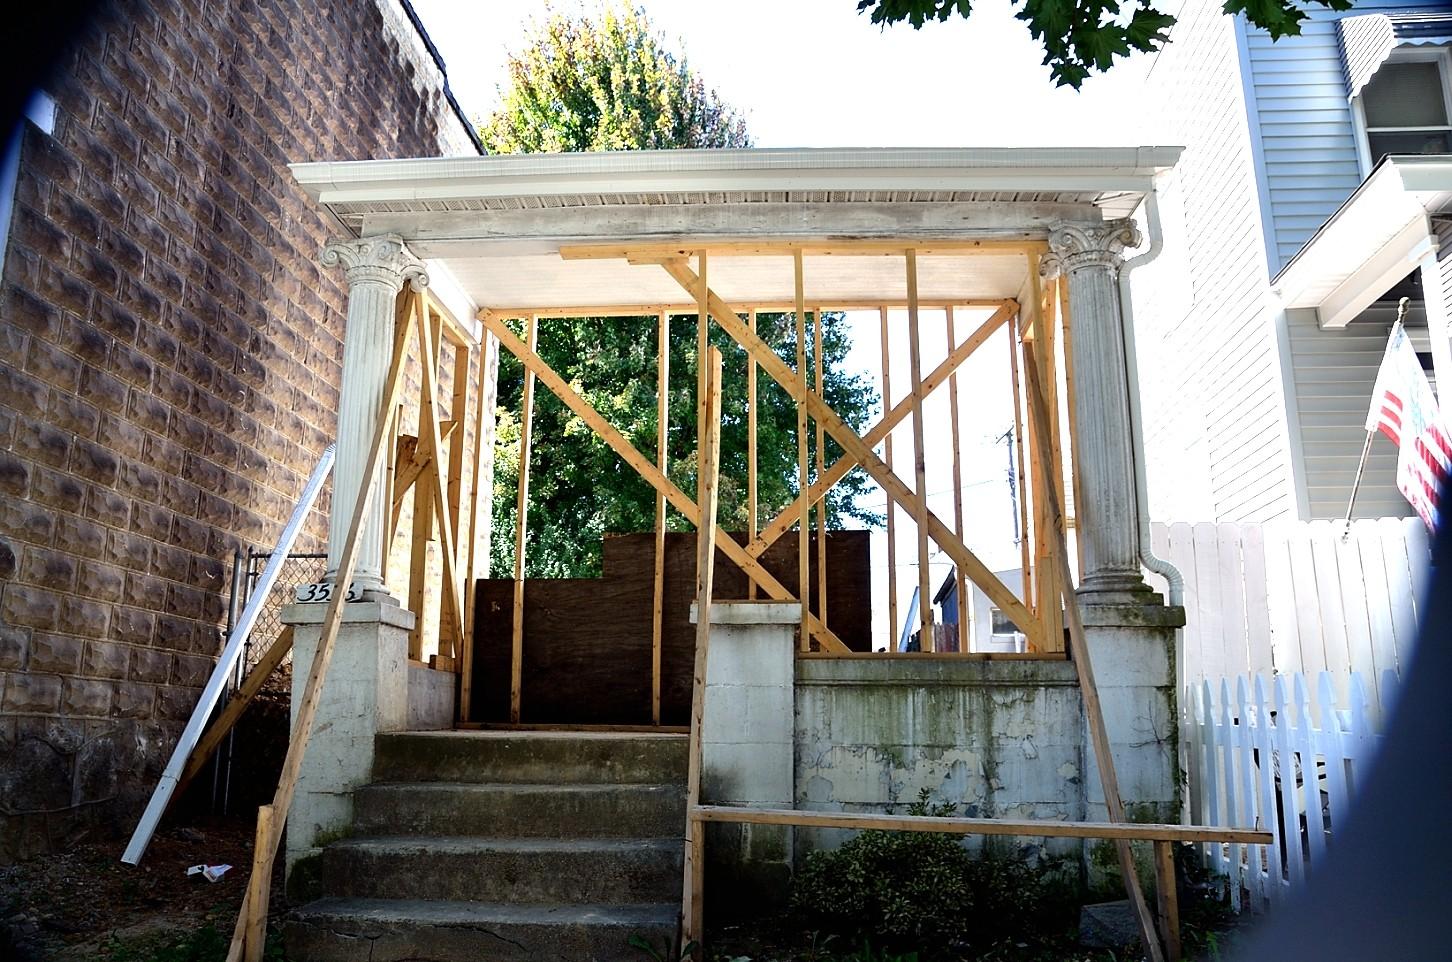 Plan on Rehabbing a House?